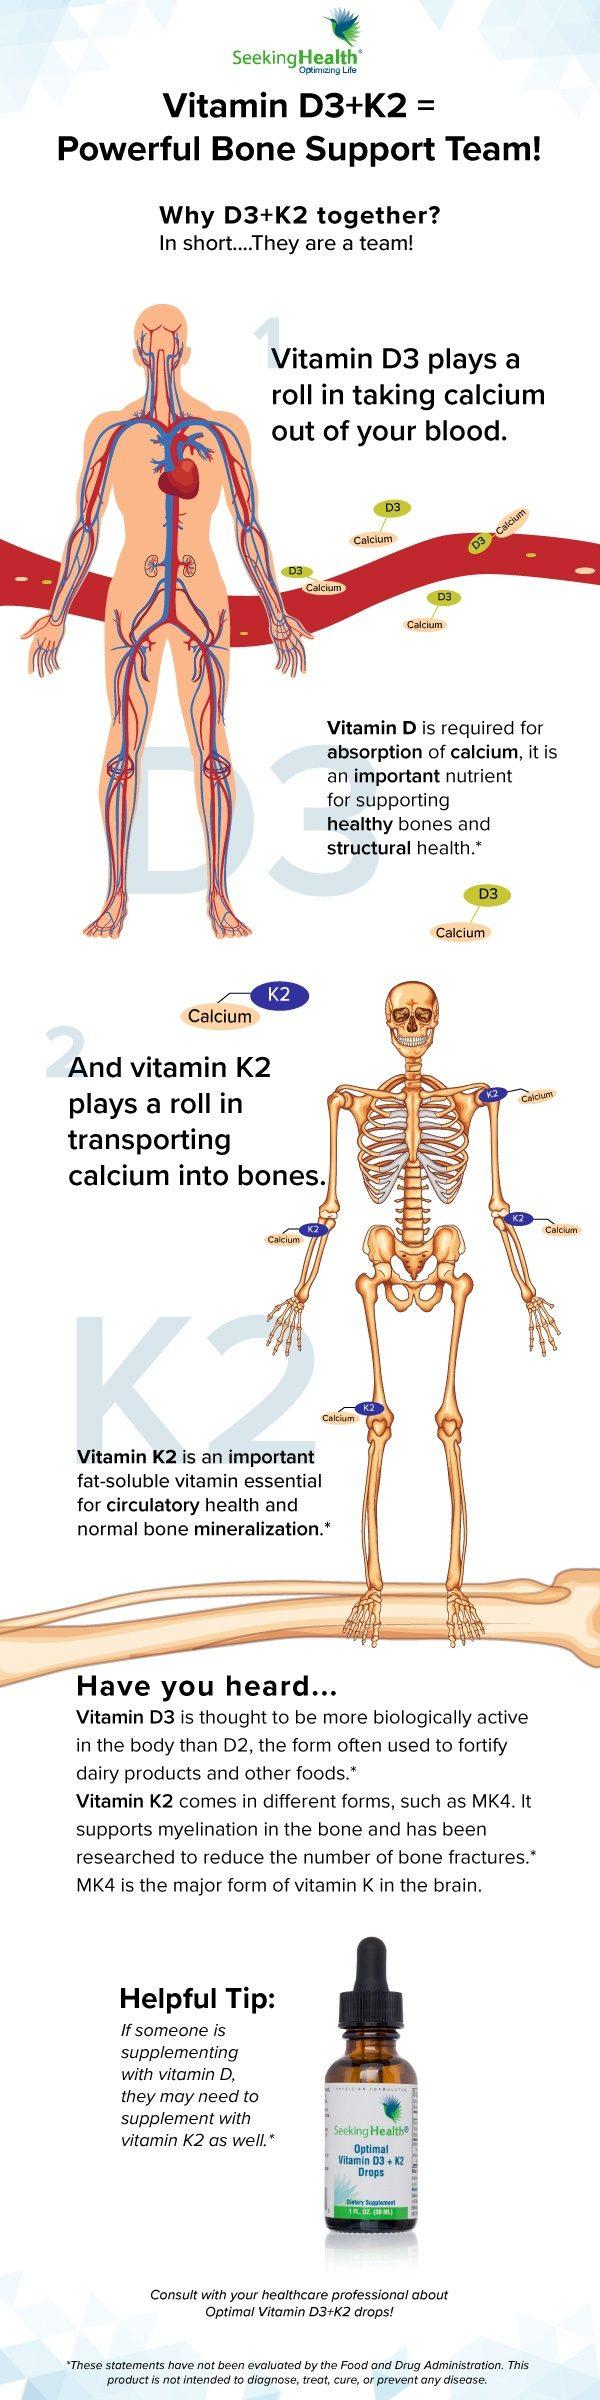 vitamind3k2-seekinghealth-infographic-1